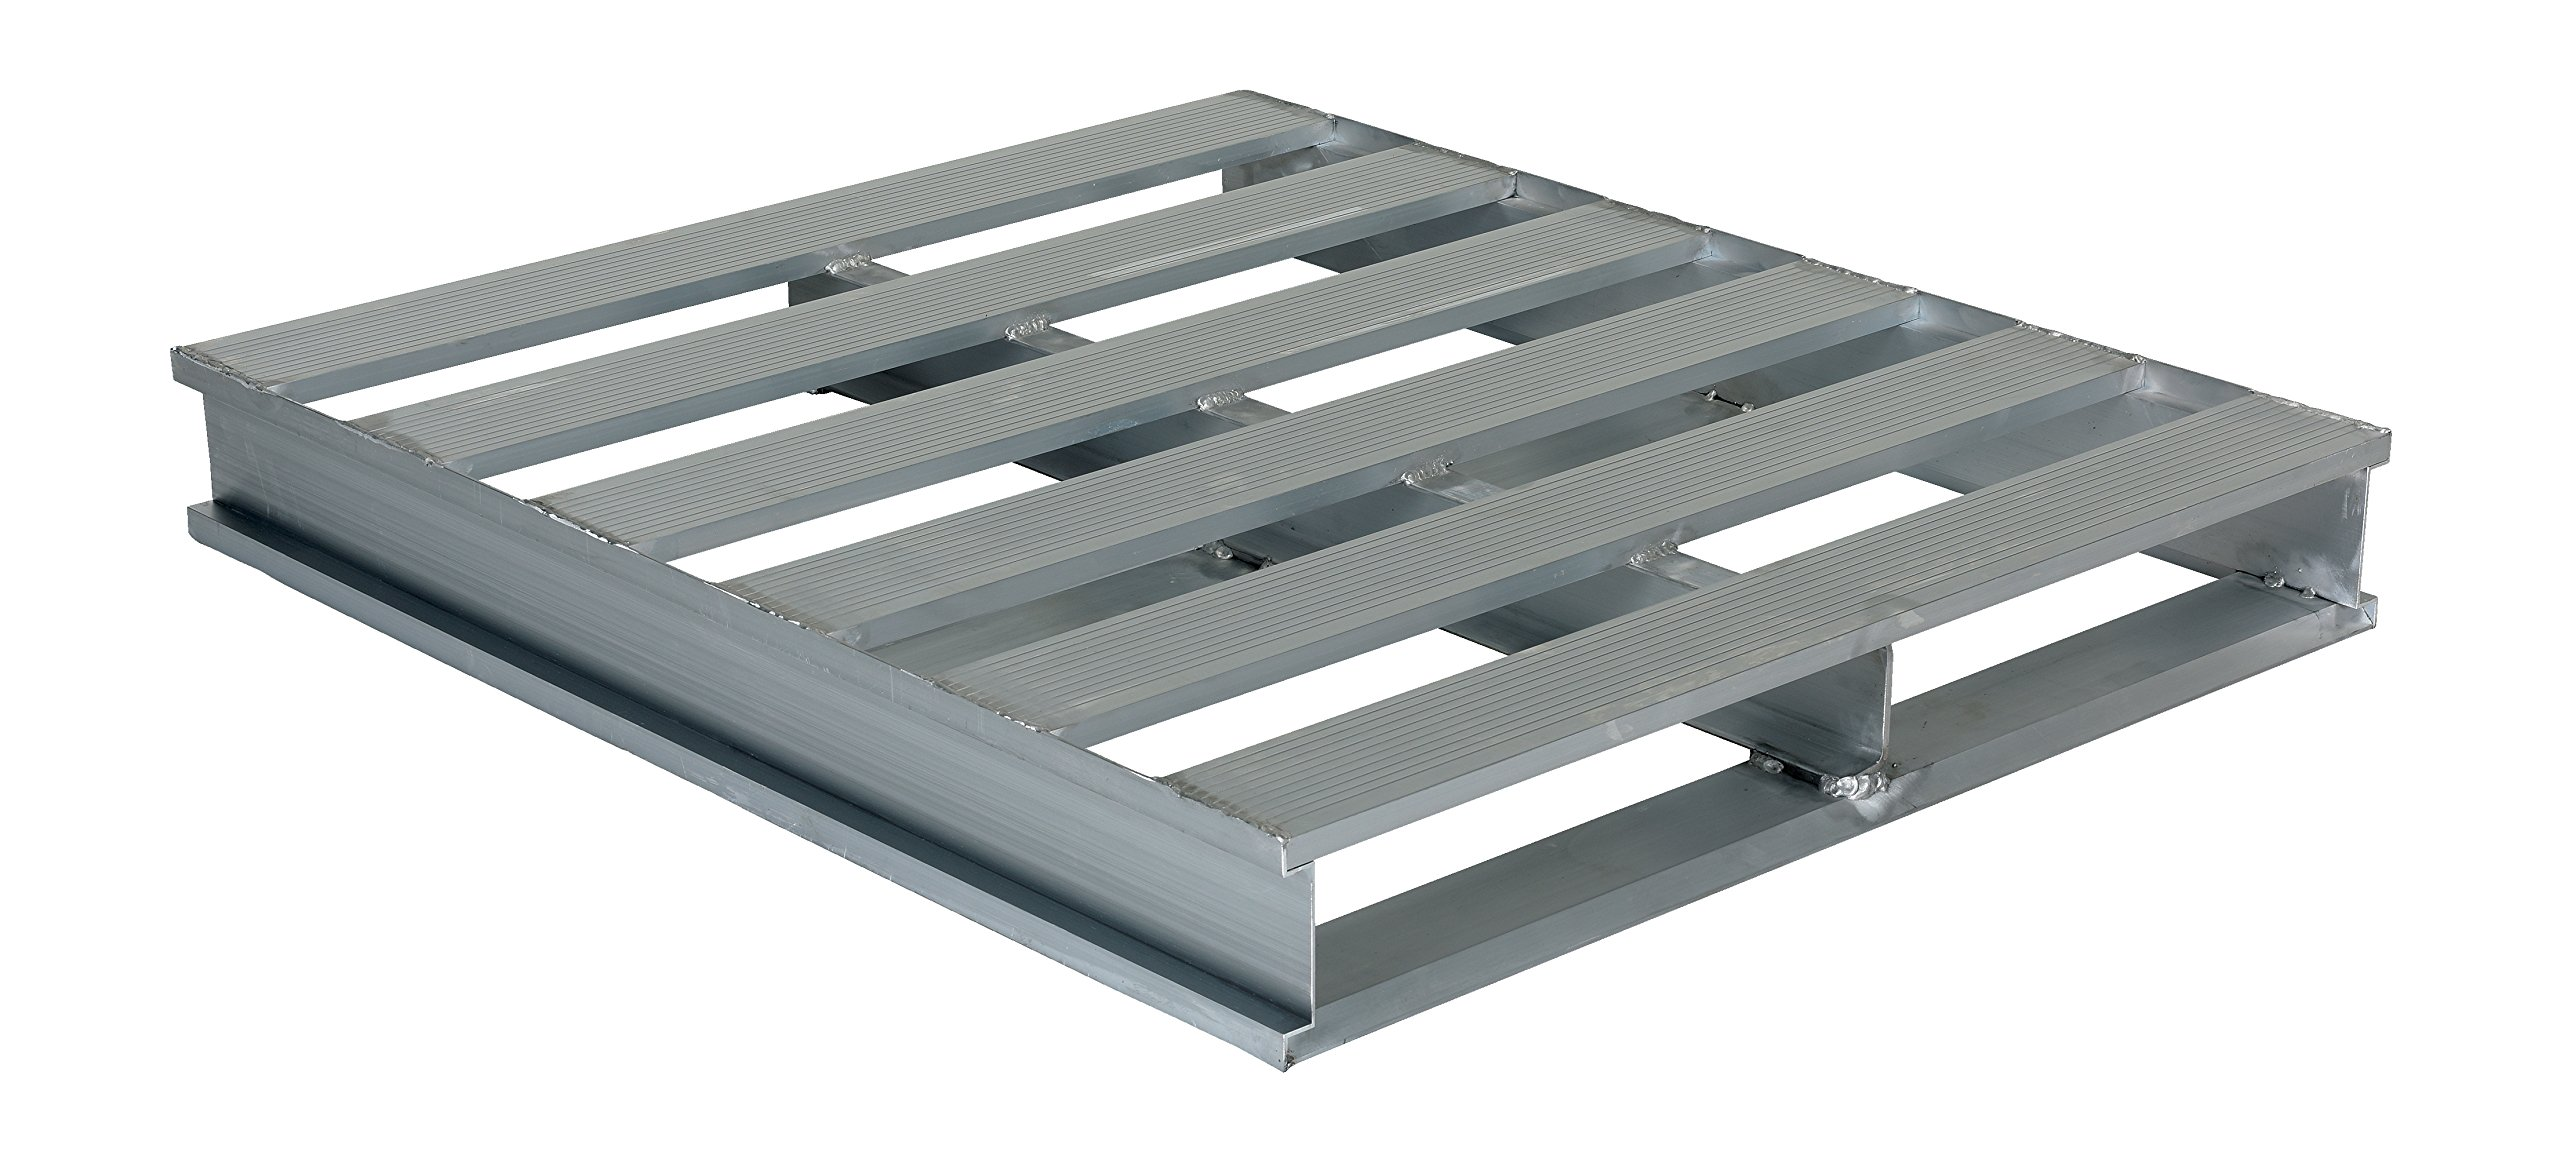 Vestil AP-4248 Heavy Duty Aluminum Pallet, 4000 lb. Capacity, 42'' x 48''